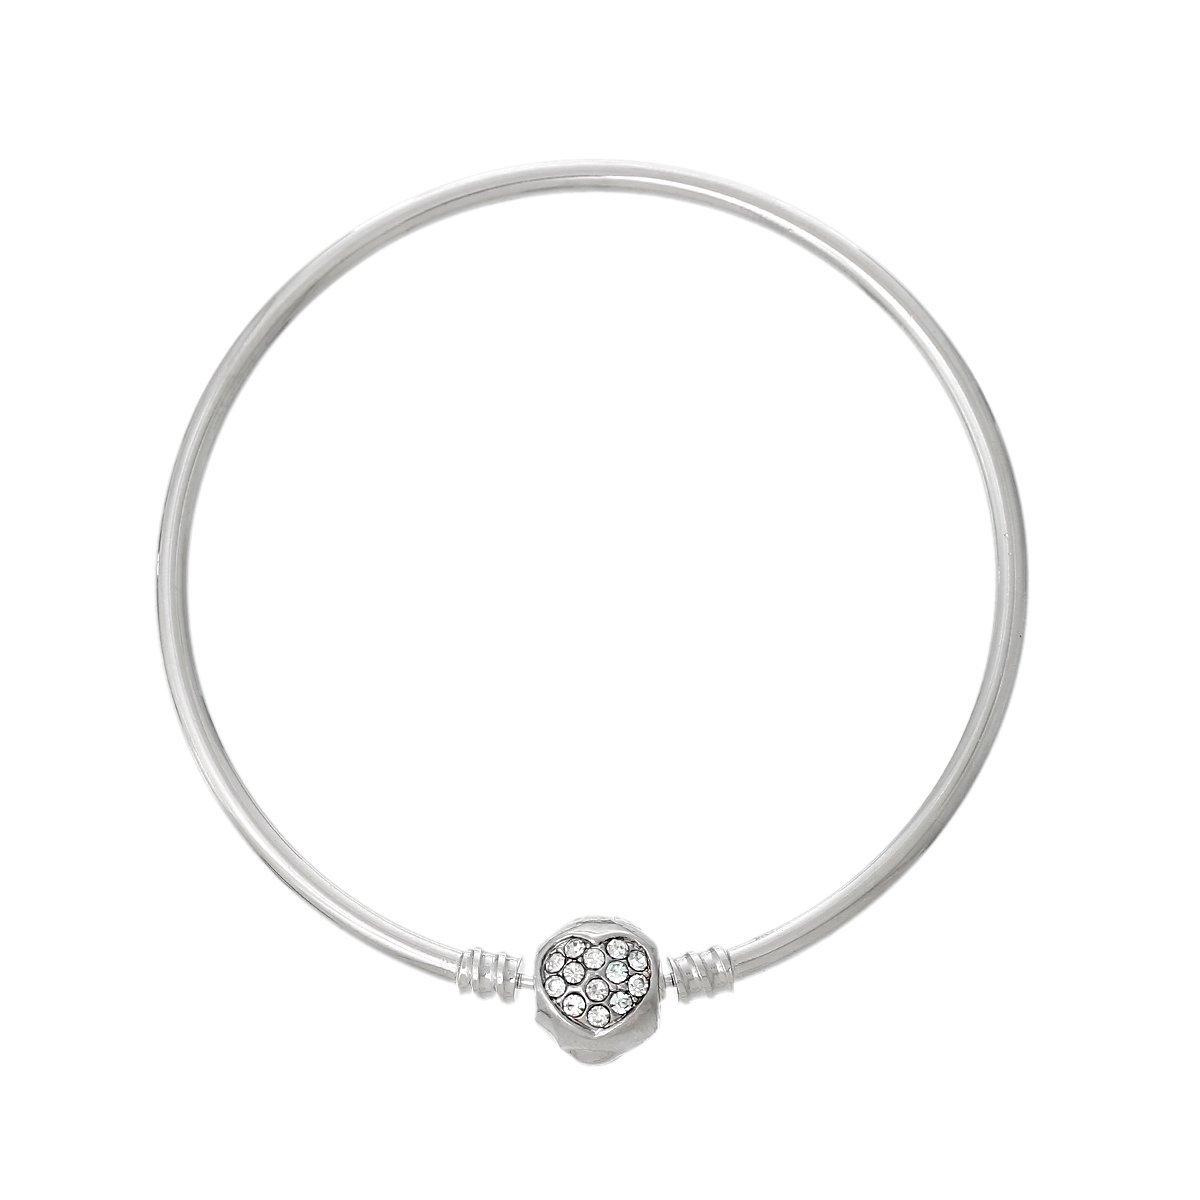 Copper European Charm Bangle Bracelet Silver Tone with Clear Rhinestones Heart